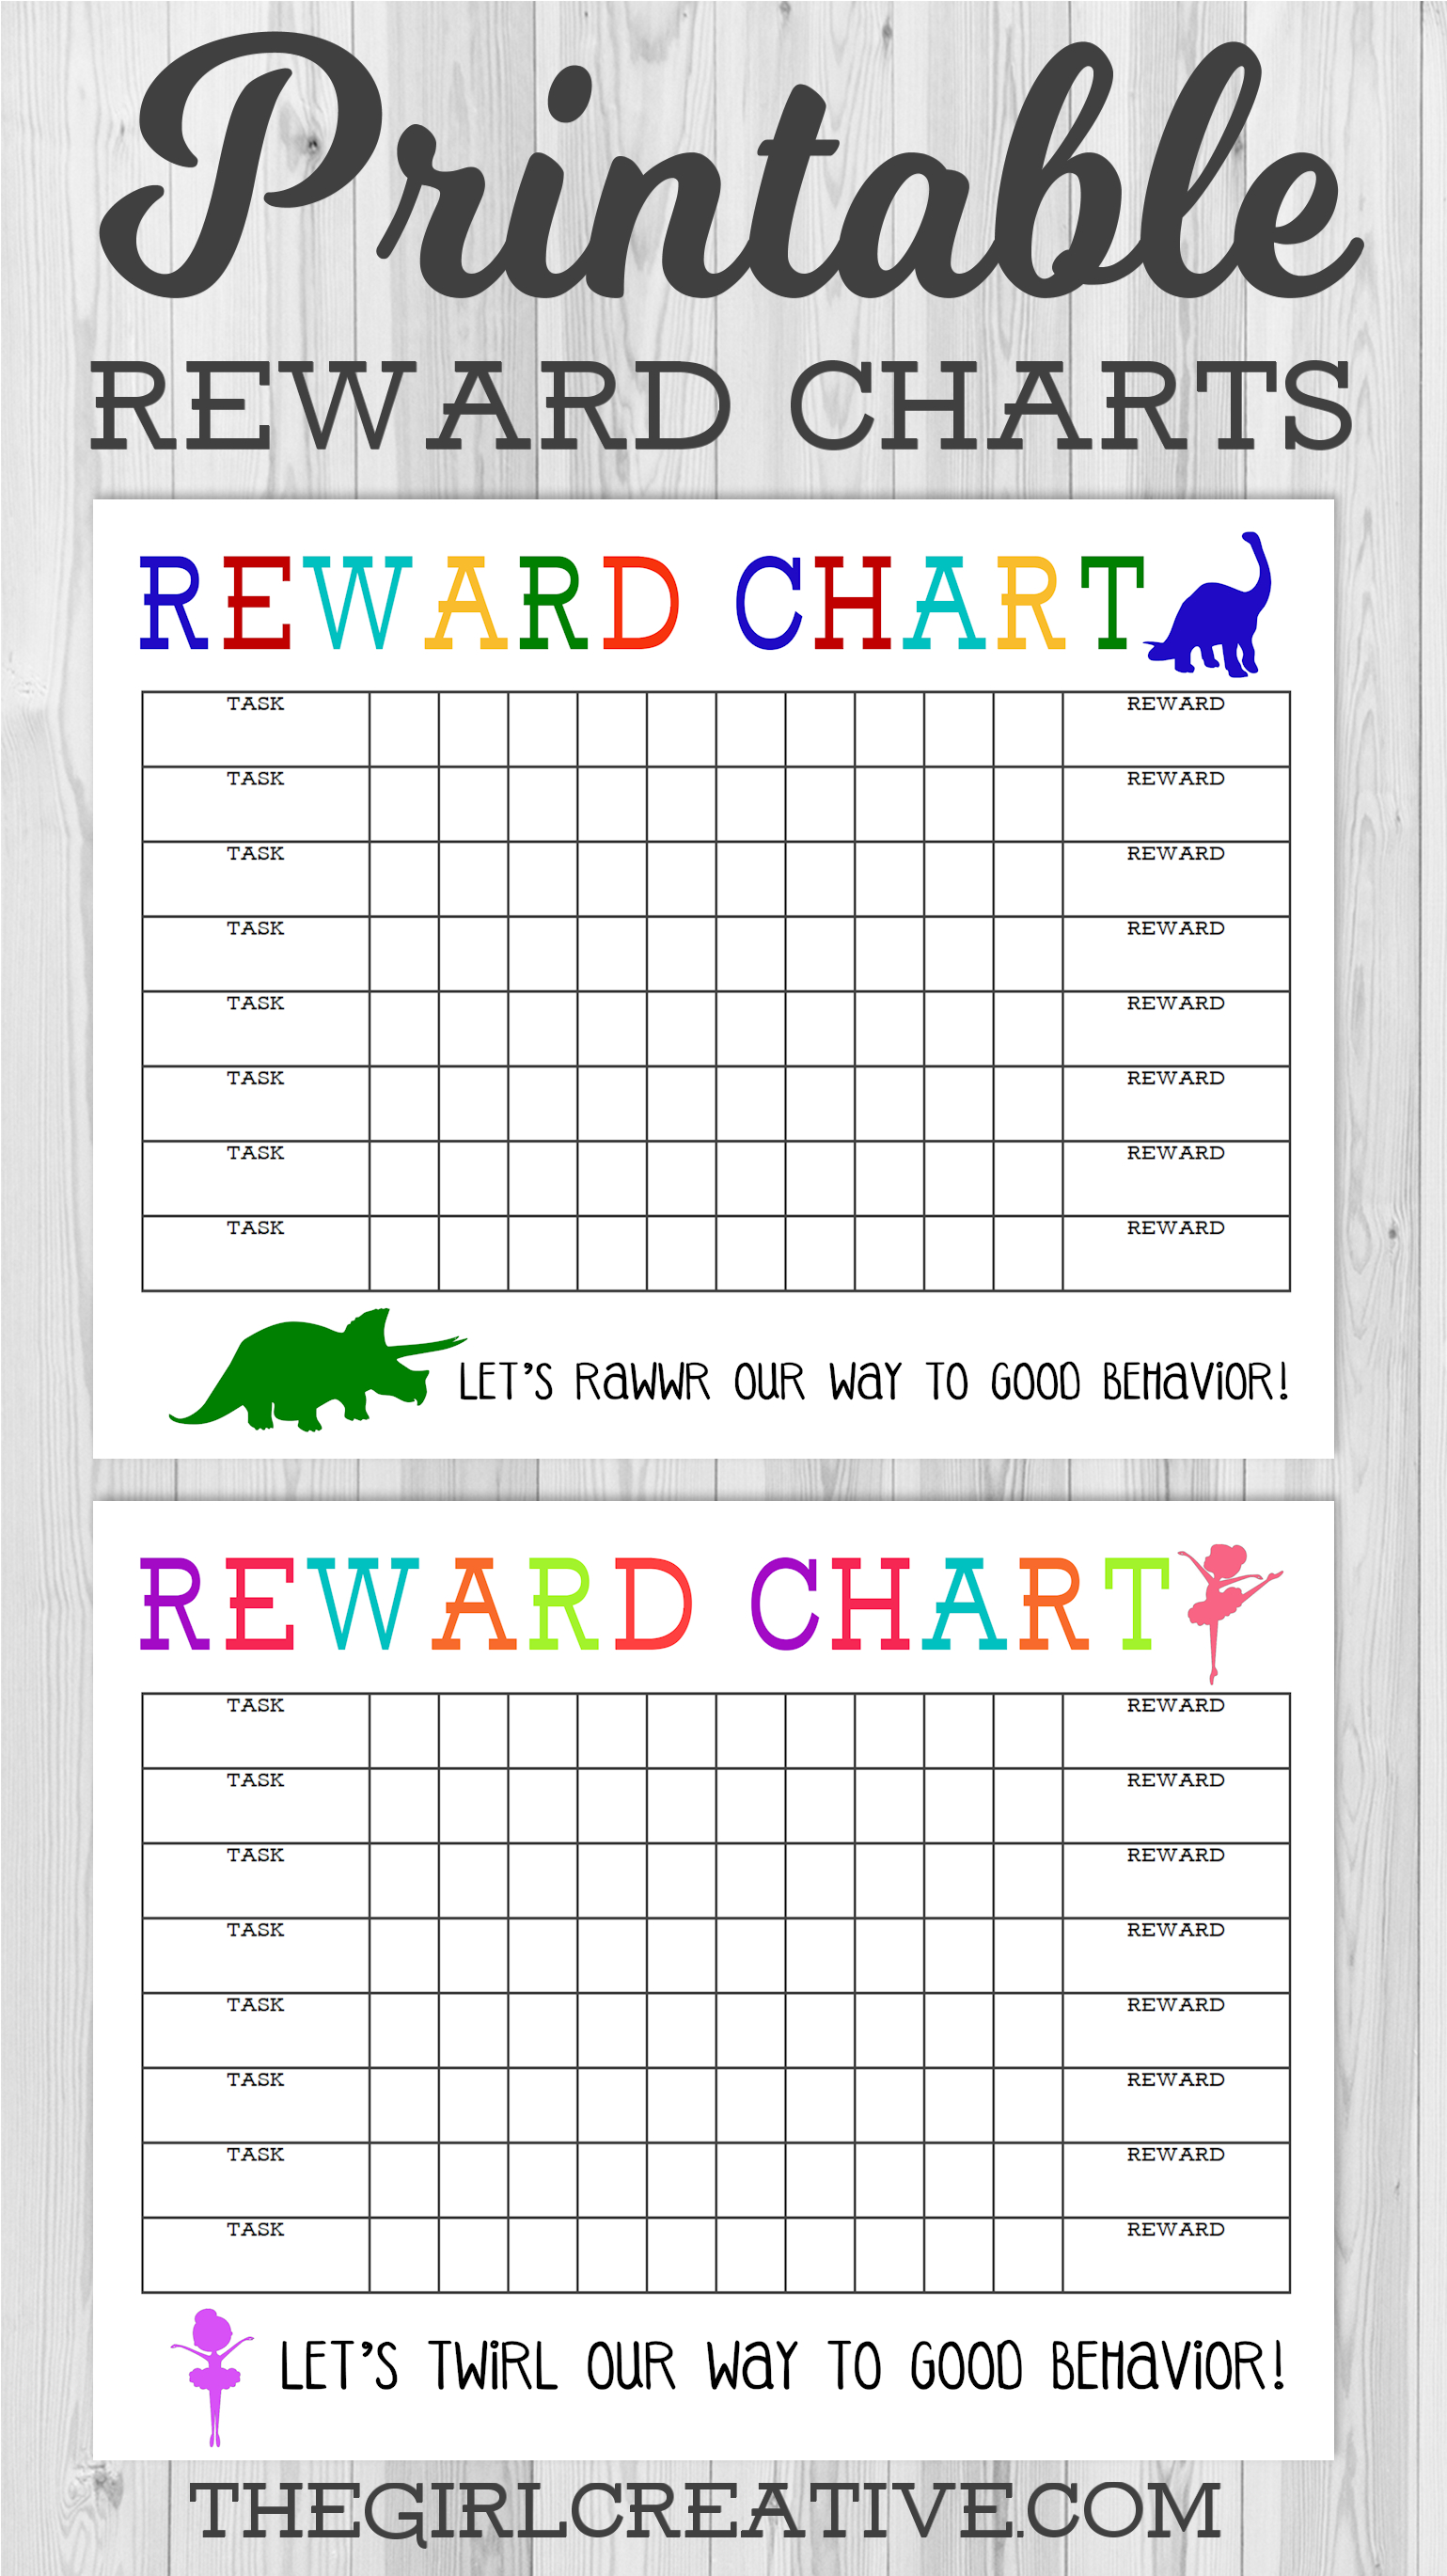 Printable Reward Chart - The Girl Creative - Free Printable Behavior Charts